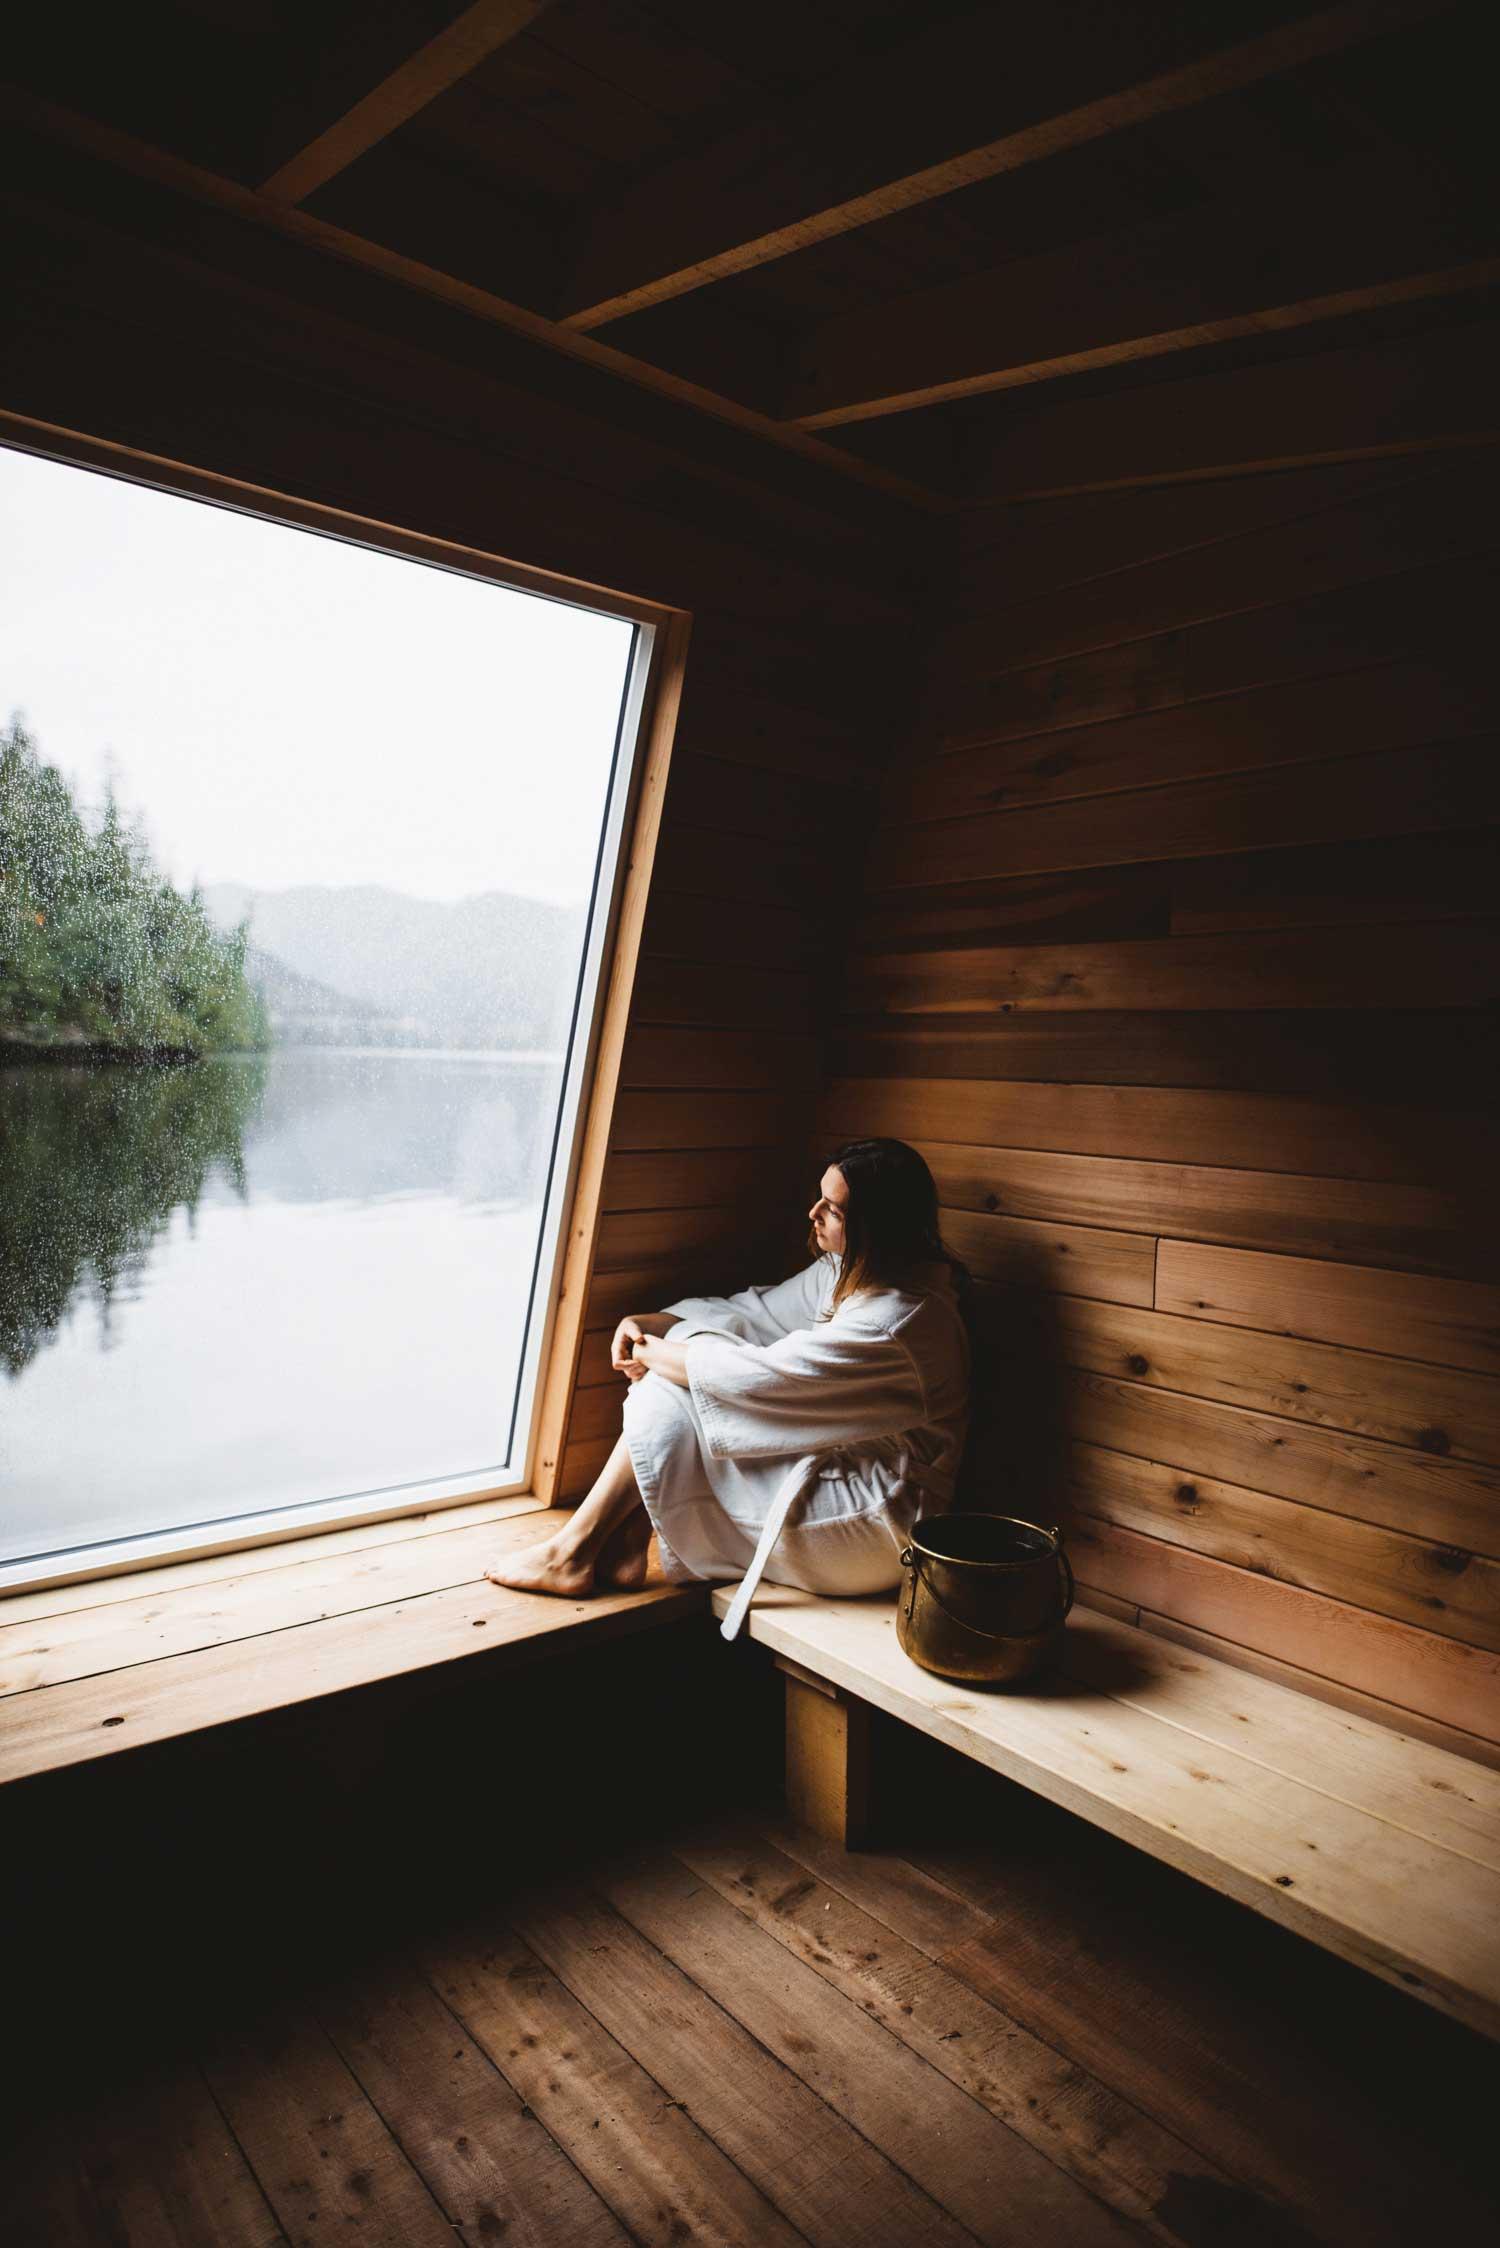 Finding Zen in the Great Bear Rainforest 6